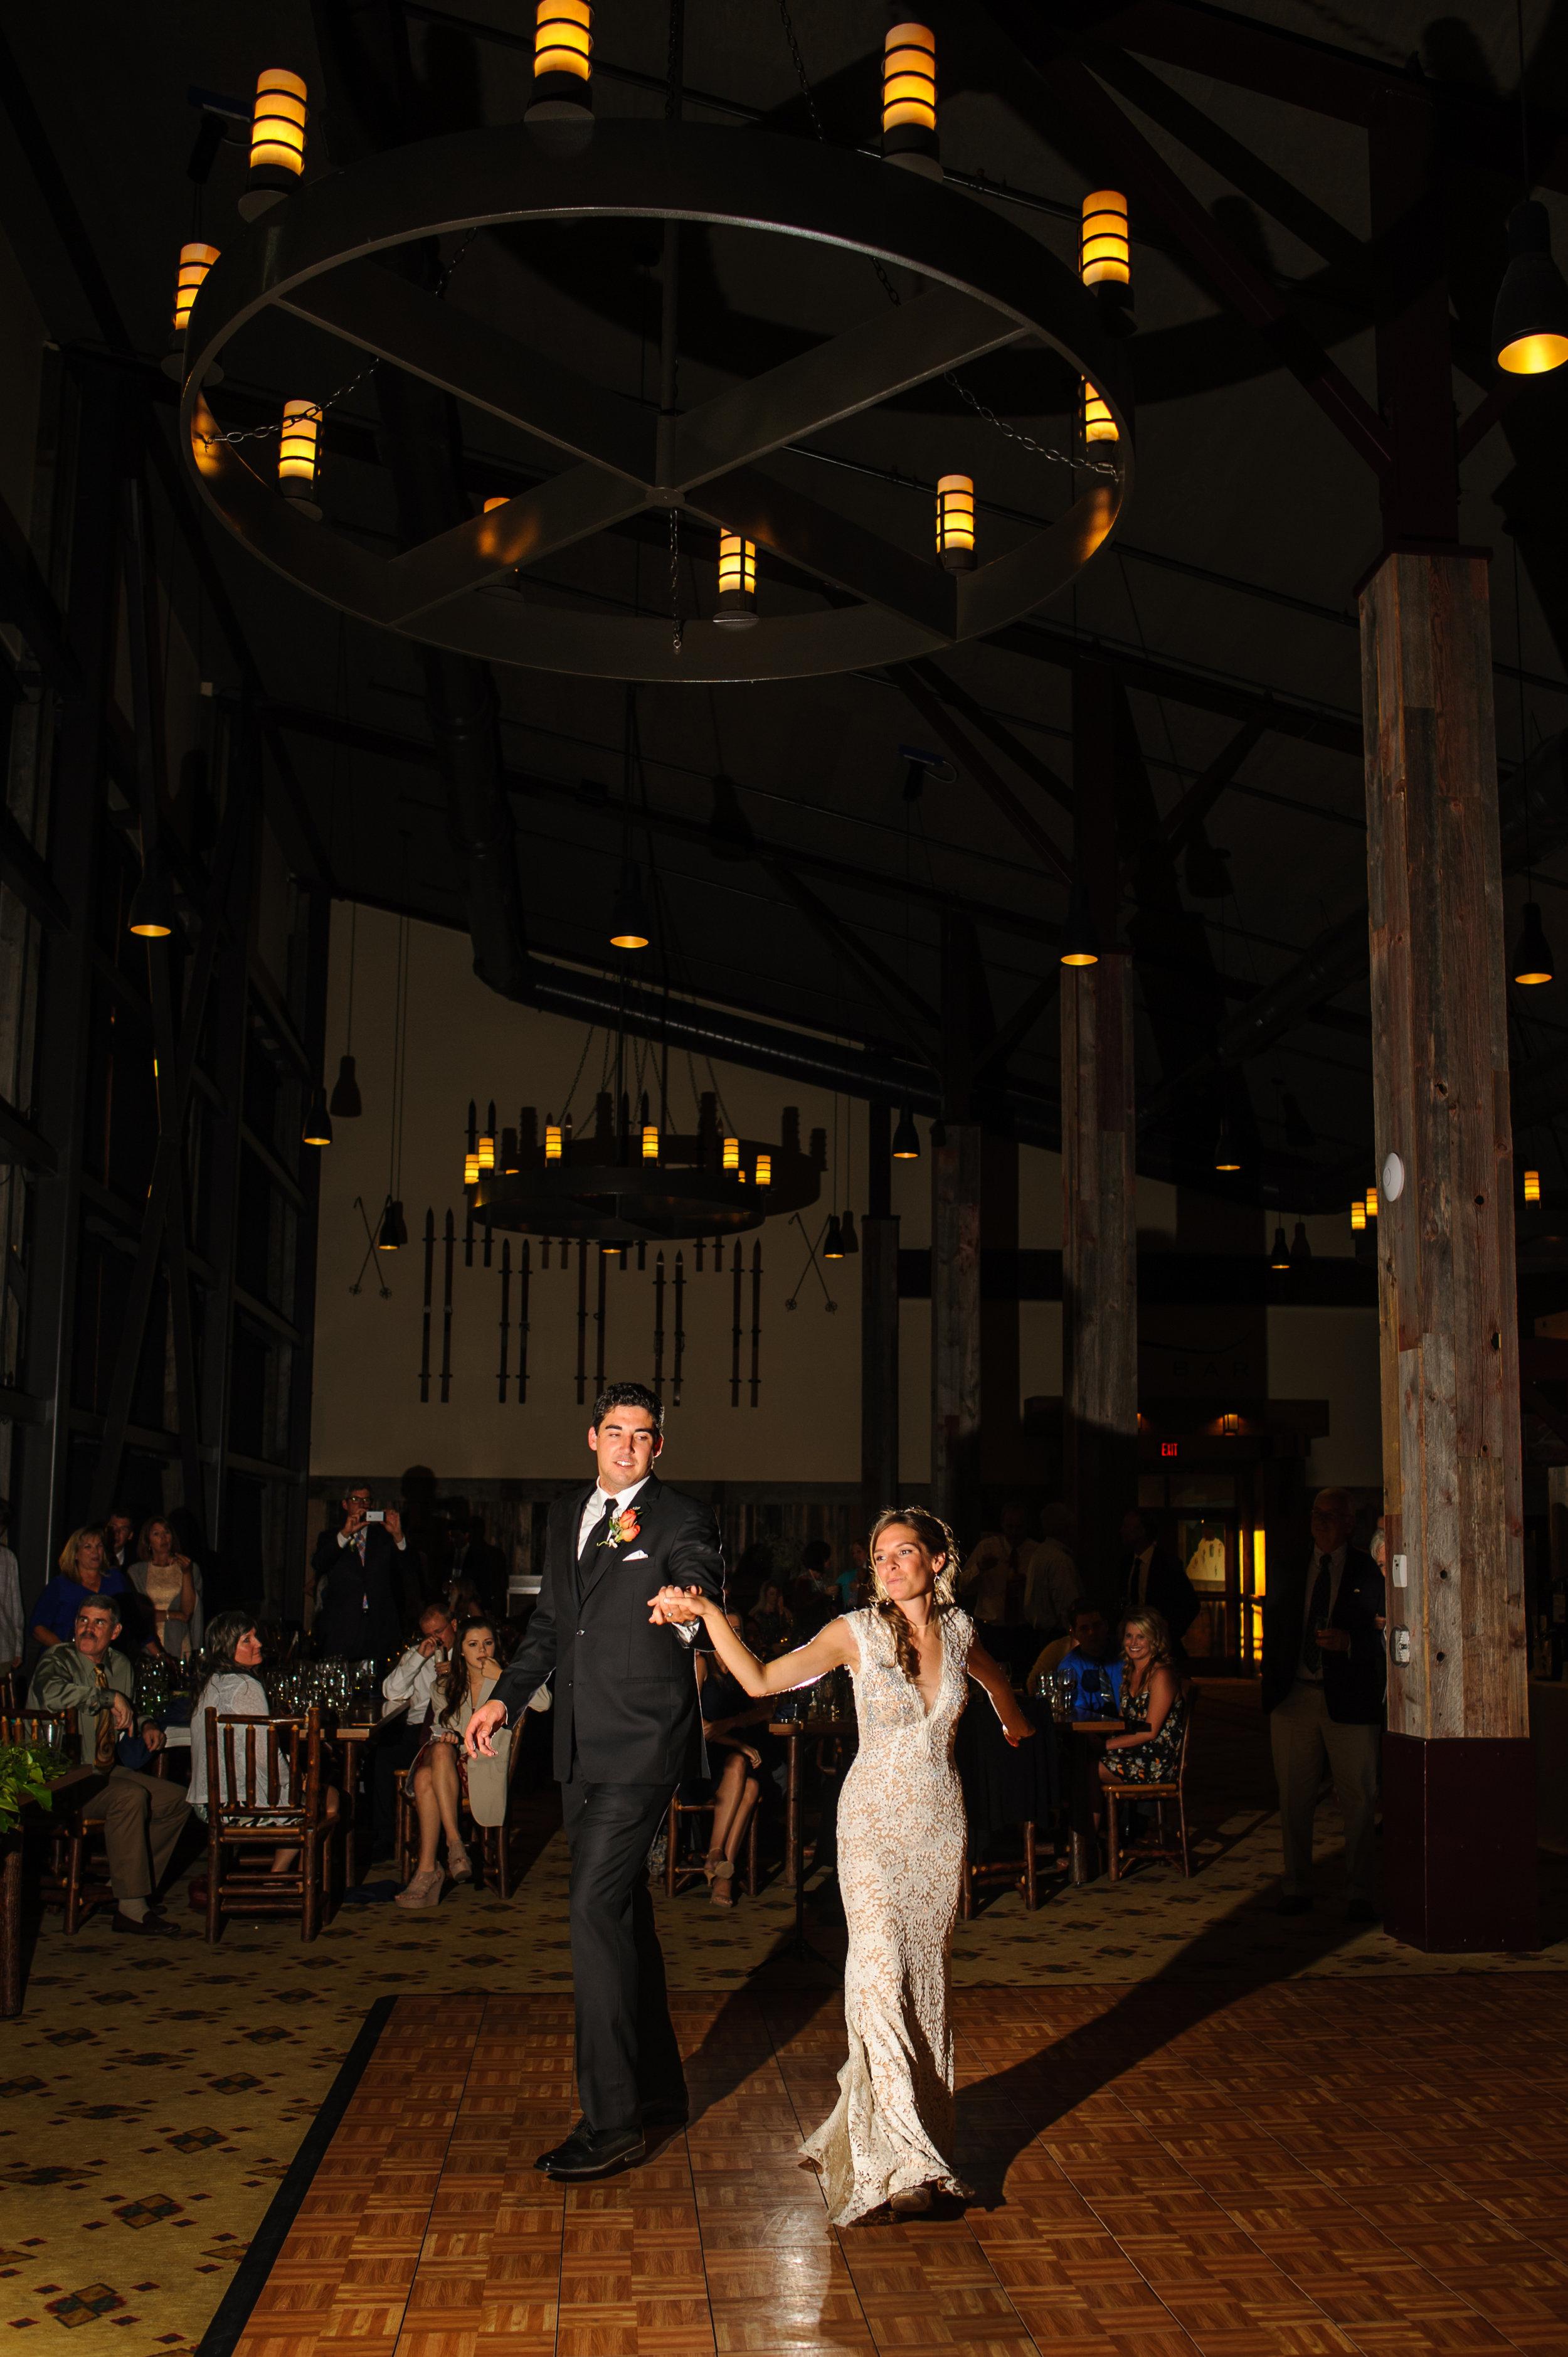 katie-myles-030-northstar-resort-tahoe-wedding-photographer-katherine-nicole-photography.JPG